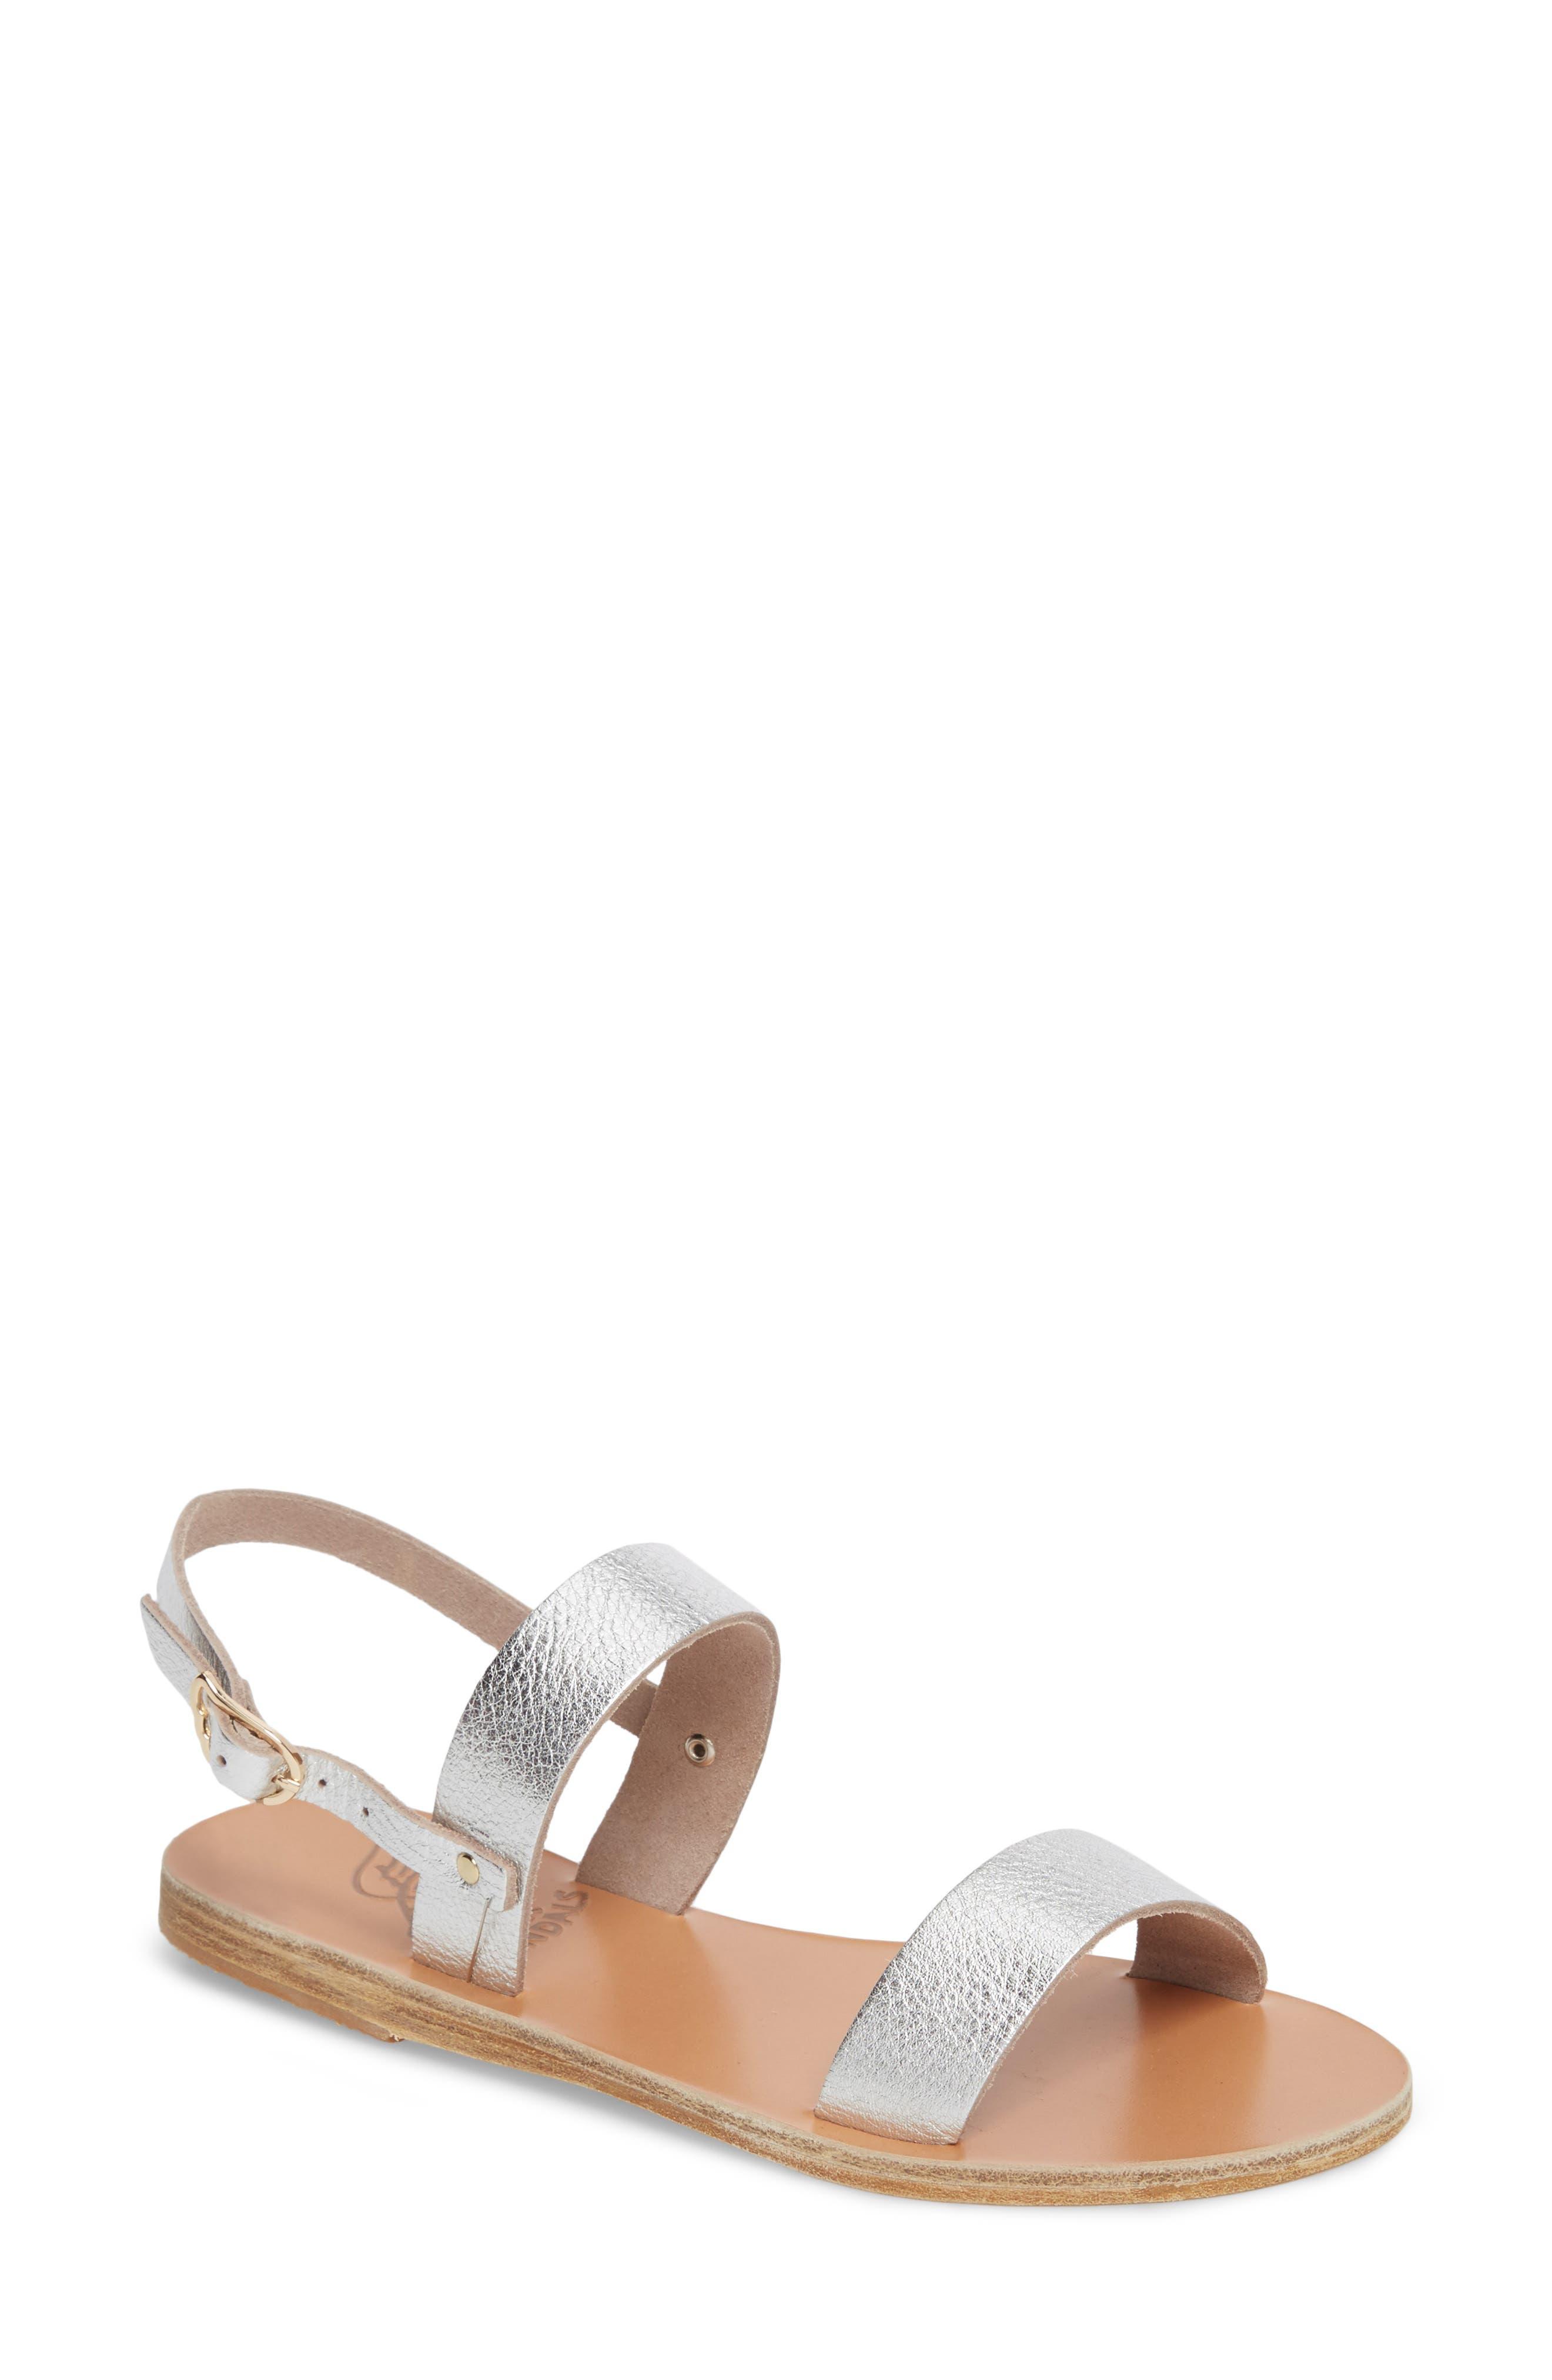 Clio Slingback Sandal,                         Main,                         color, 041